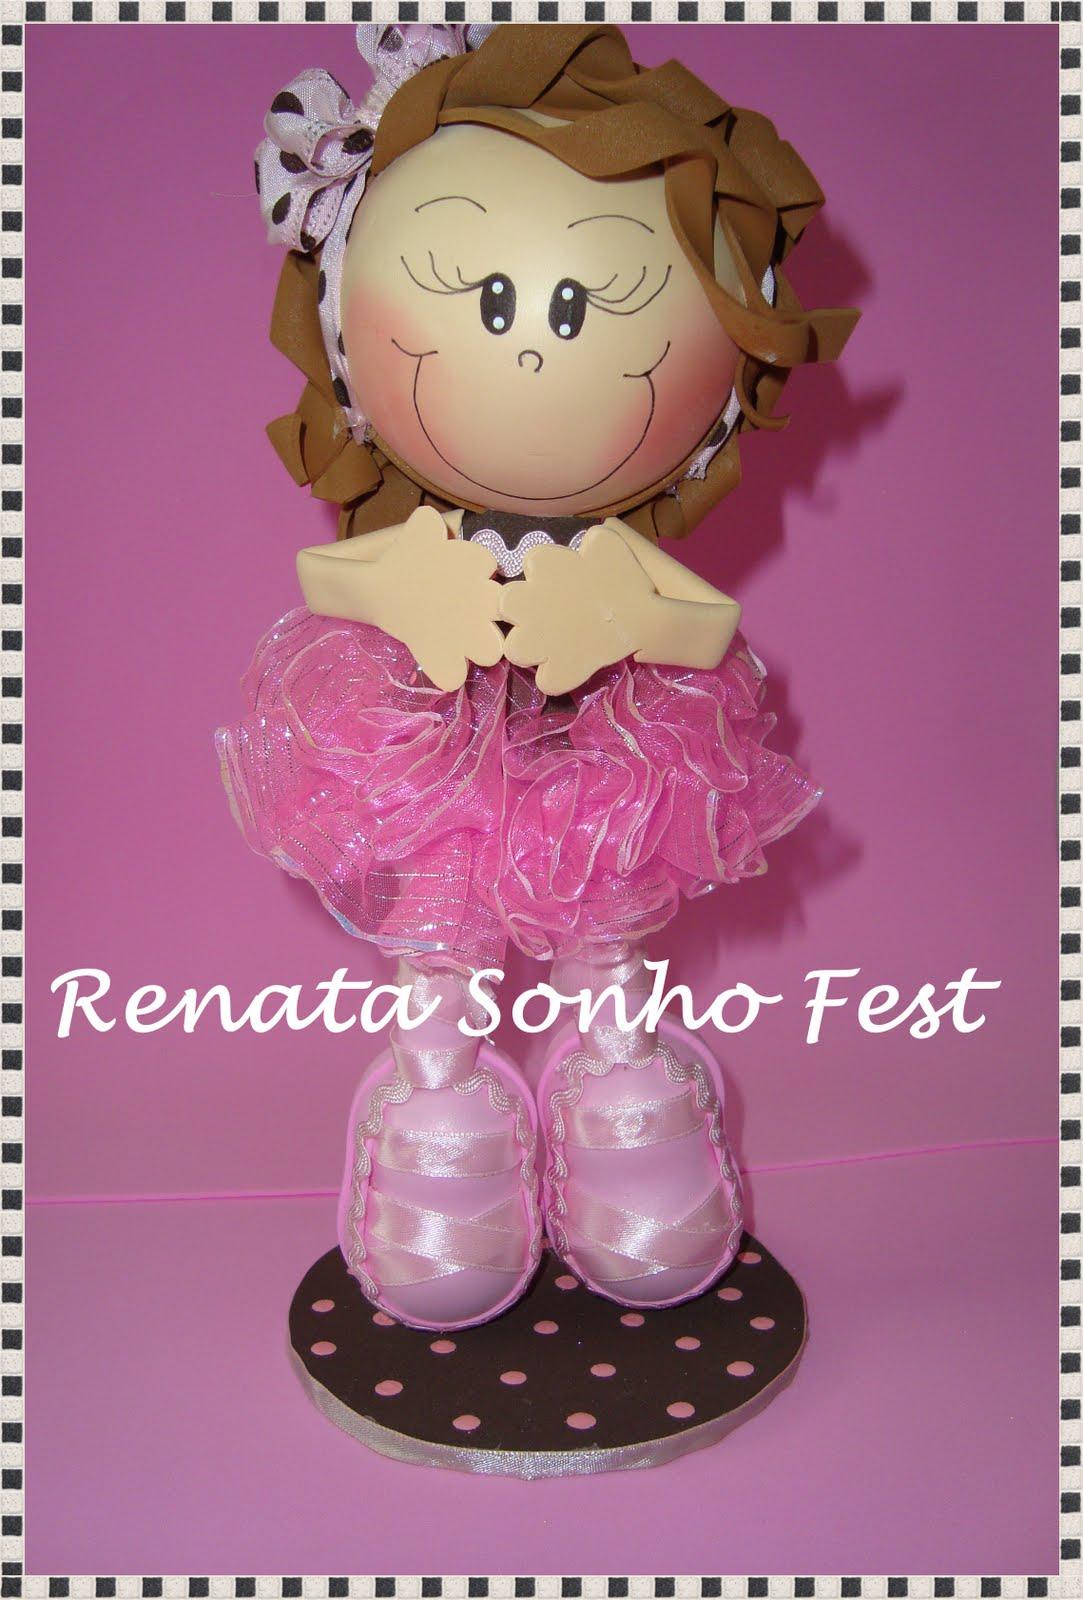 Renata Sonho Fest: Festa Bailarina 1 ,enfeites de mesa , lembrancinhas